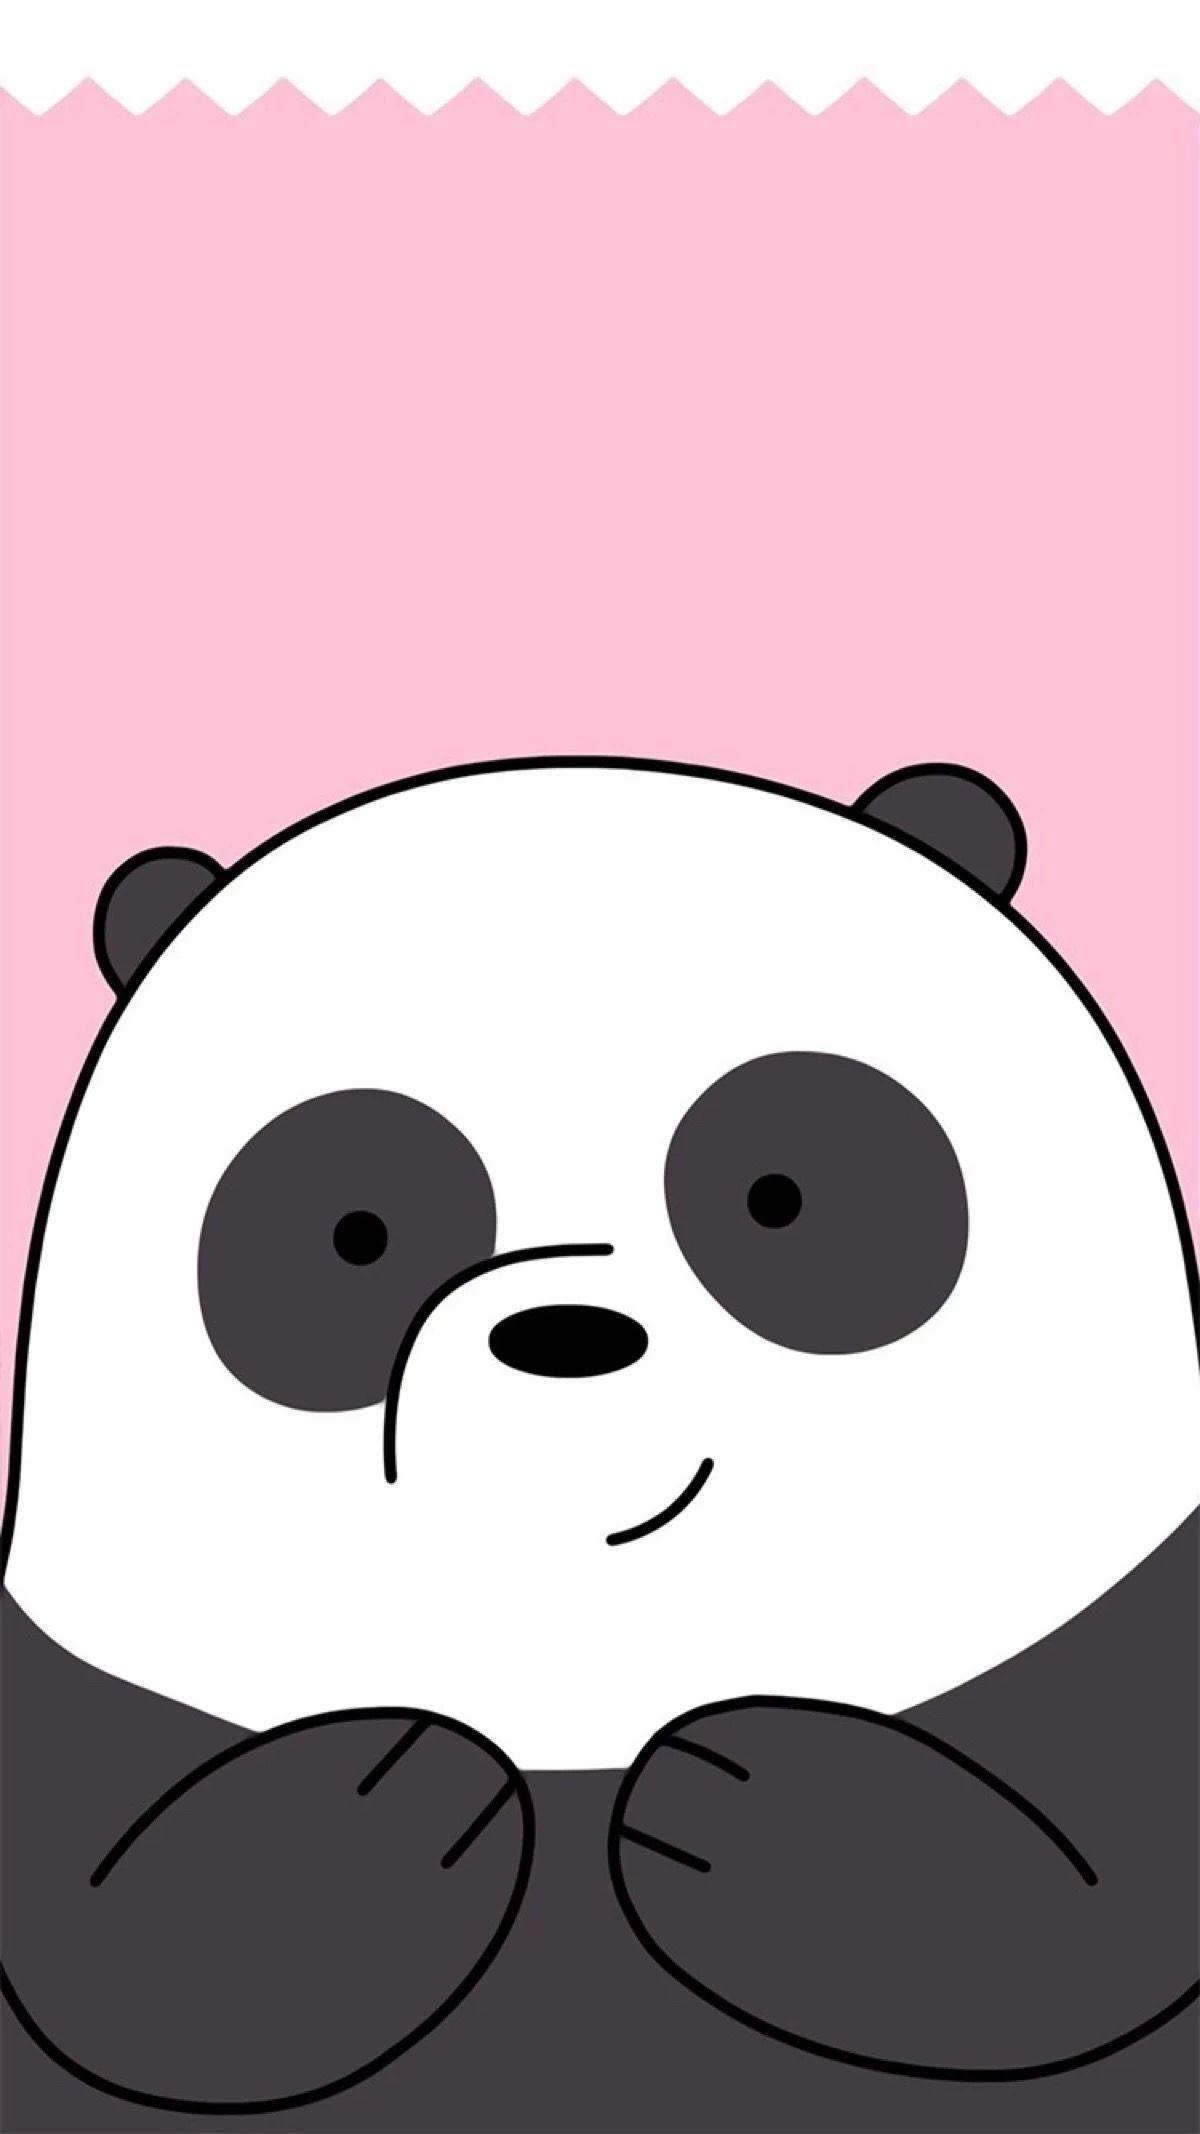 Res: 1200x2134, Cute Wallpapers, Iphone Wallpapers, Album, Bare Bears, Animal Drawings,  Panda, Samsung, Kawaii, Phone Wallpapers